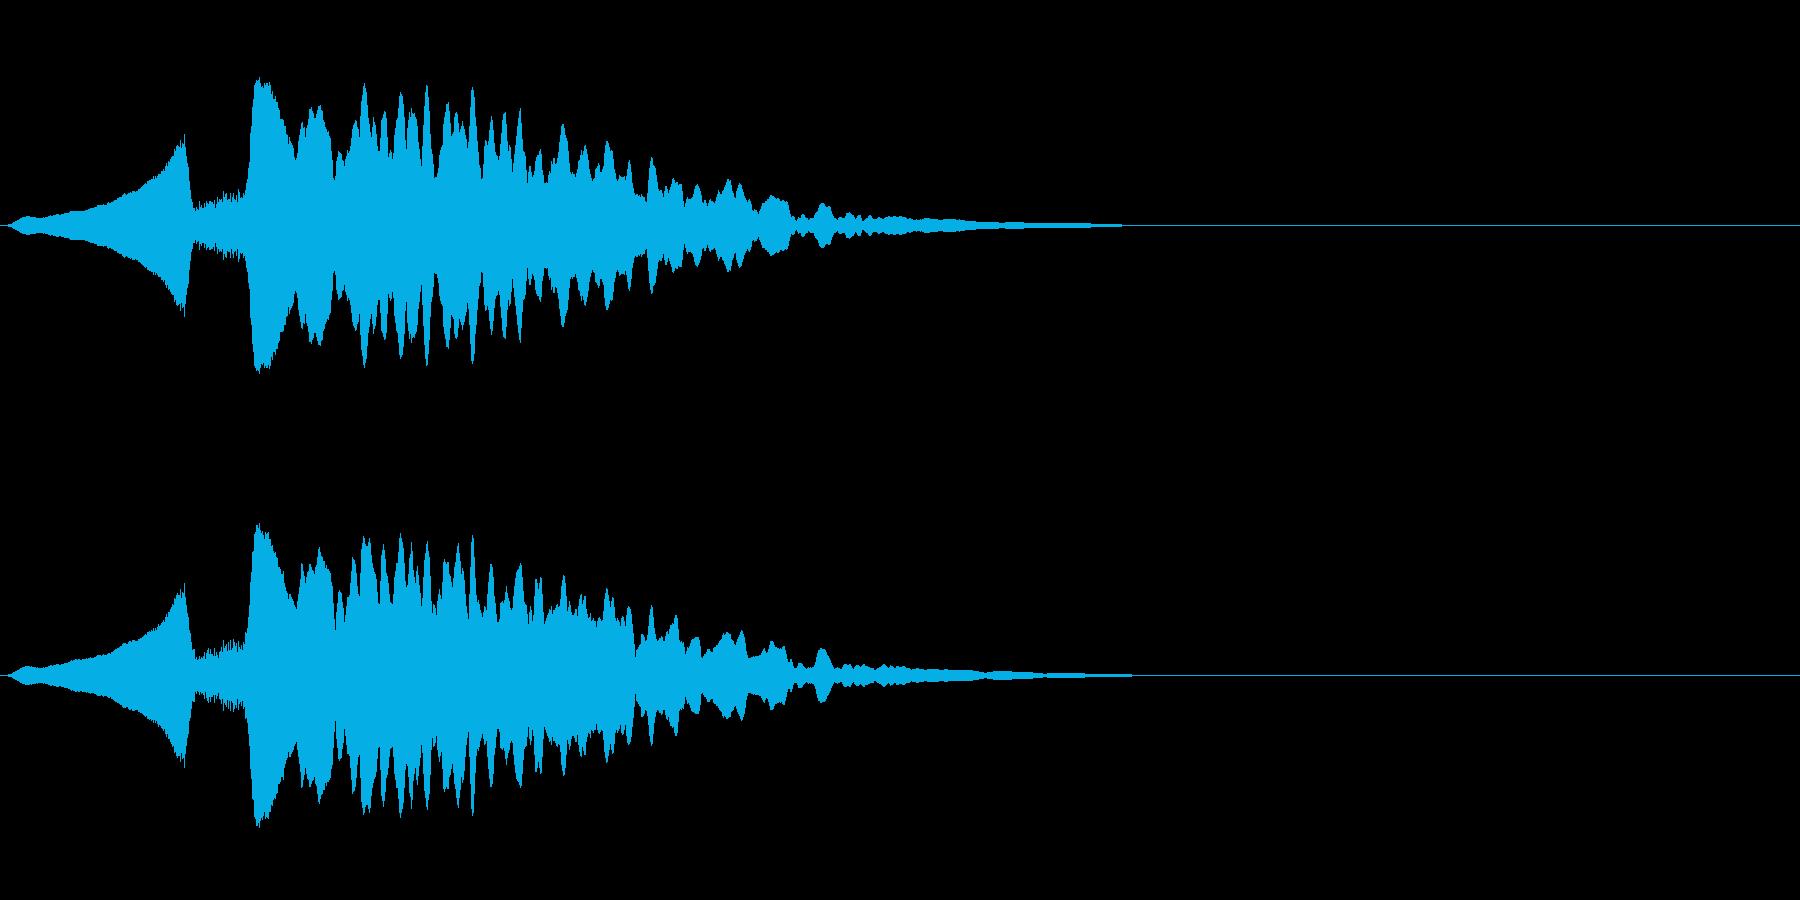 尺八 生演奏 古典風 残響音有 #8の再生済みの波形